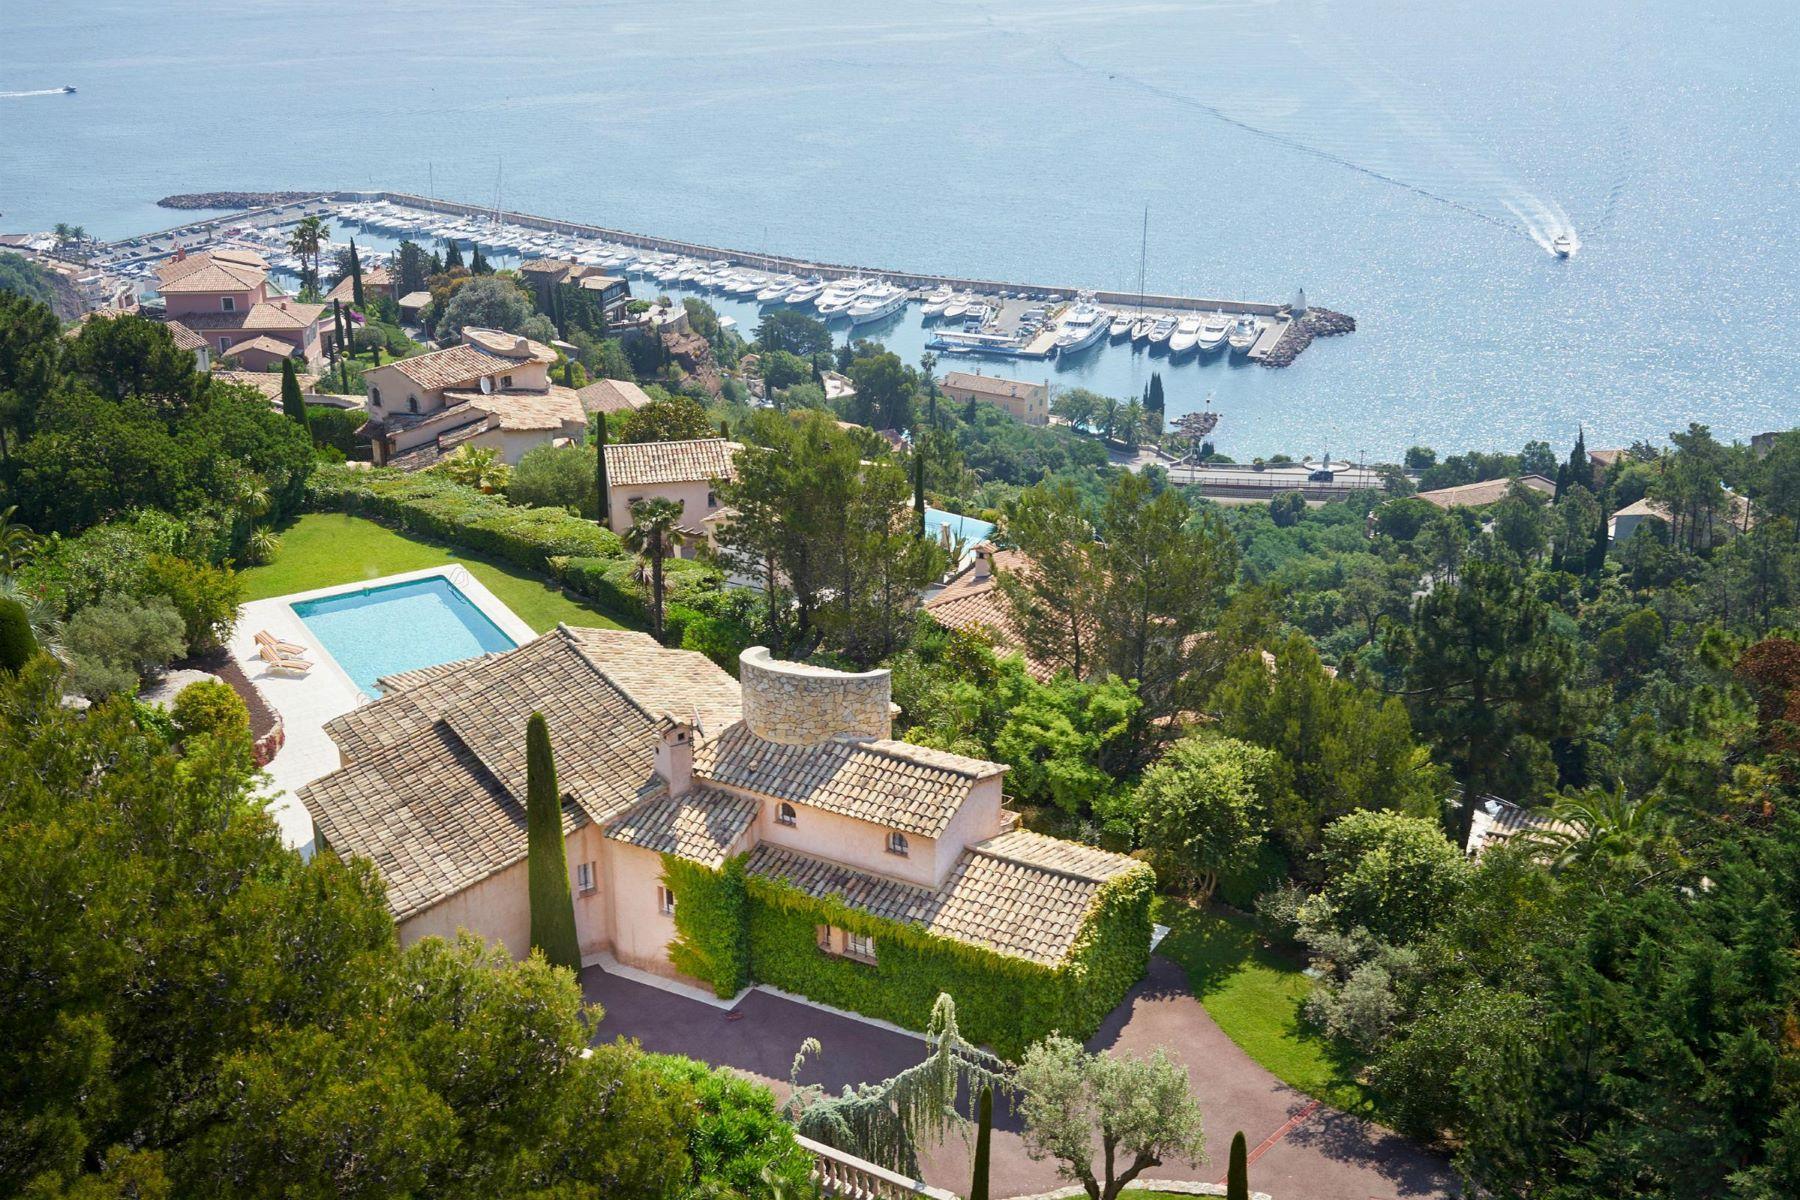 Villa per Vendita alle ore Wonderful provençal house with panoramic sea views Theoule Sur Mer, Provenza-Alpi-Costa Azzurra, 06590 Francia